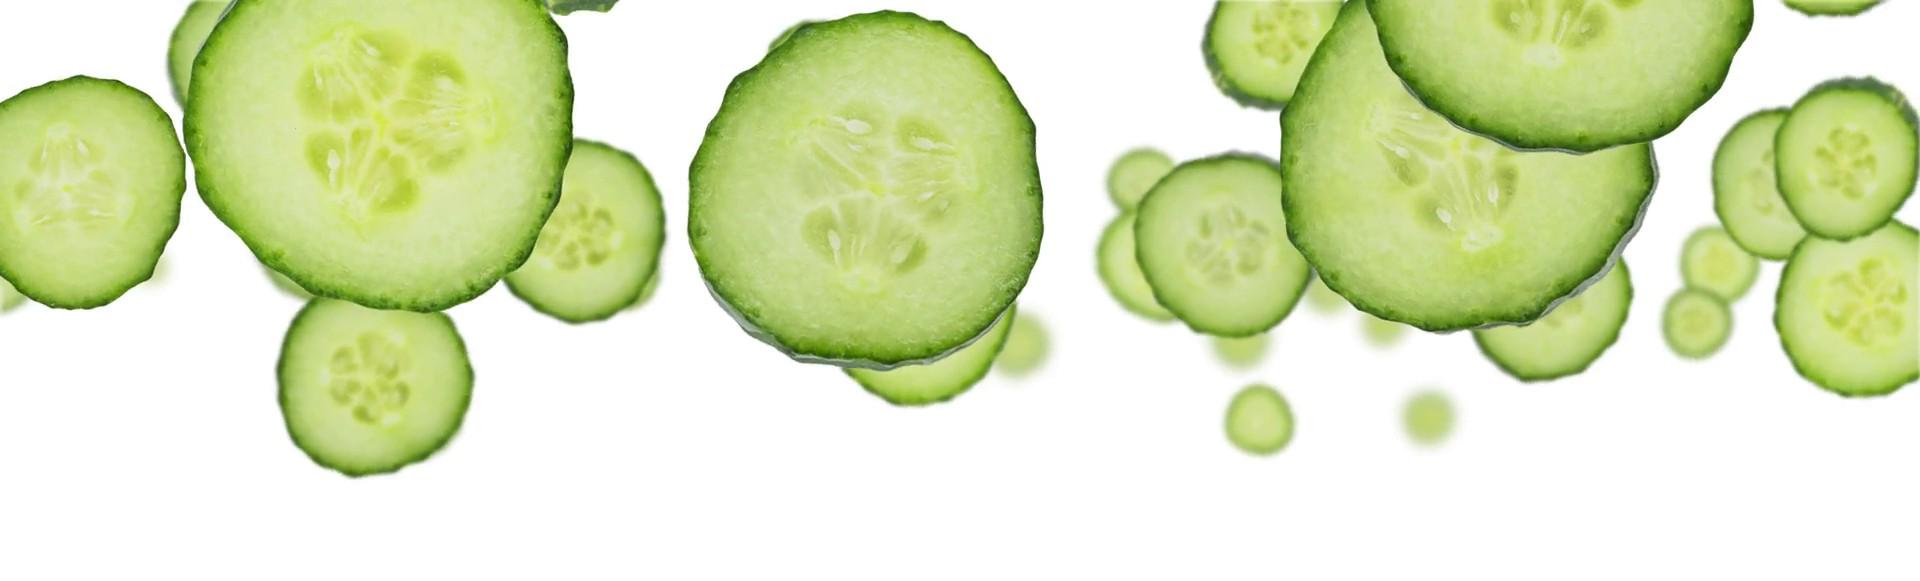 Cucumber PNG Transparent Images, Pictures, Photos.